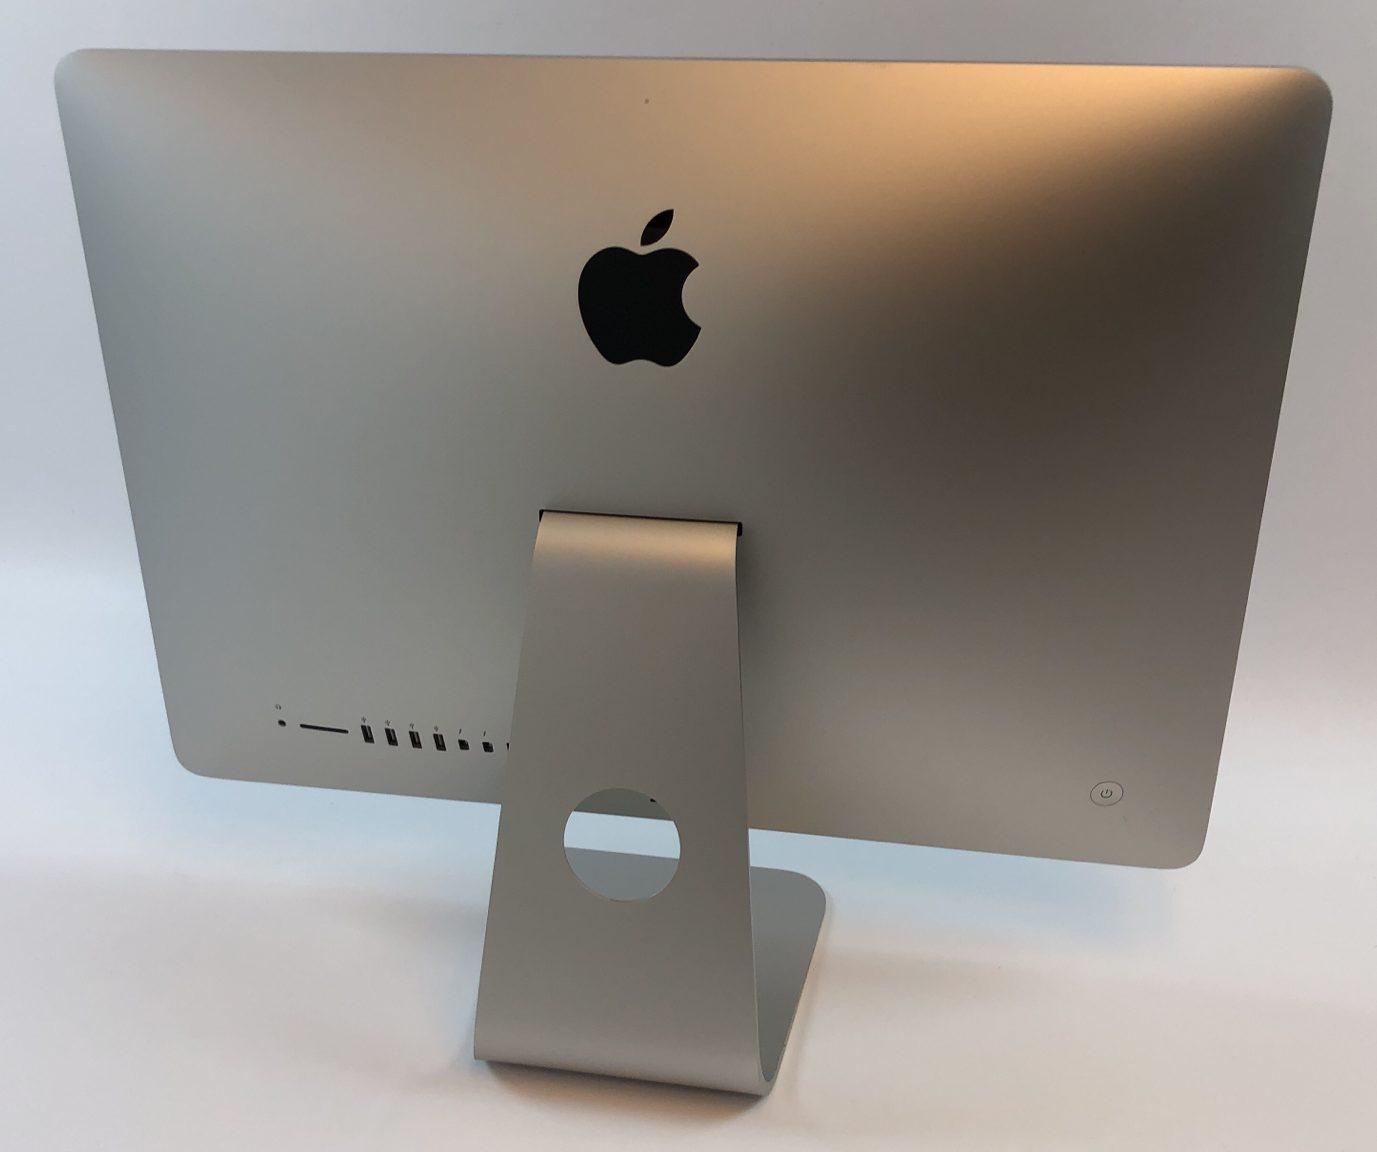 "iMac 21.5"" Late 2013 (Intel Quad-Core i5 2.7 GHz 8 GB RAM 1 TB HDD), Intel Quad-Core i5 2.7 GHz, 8 GB RAM, 1 TB HDD, Kuva 2"